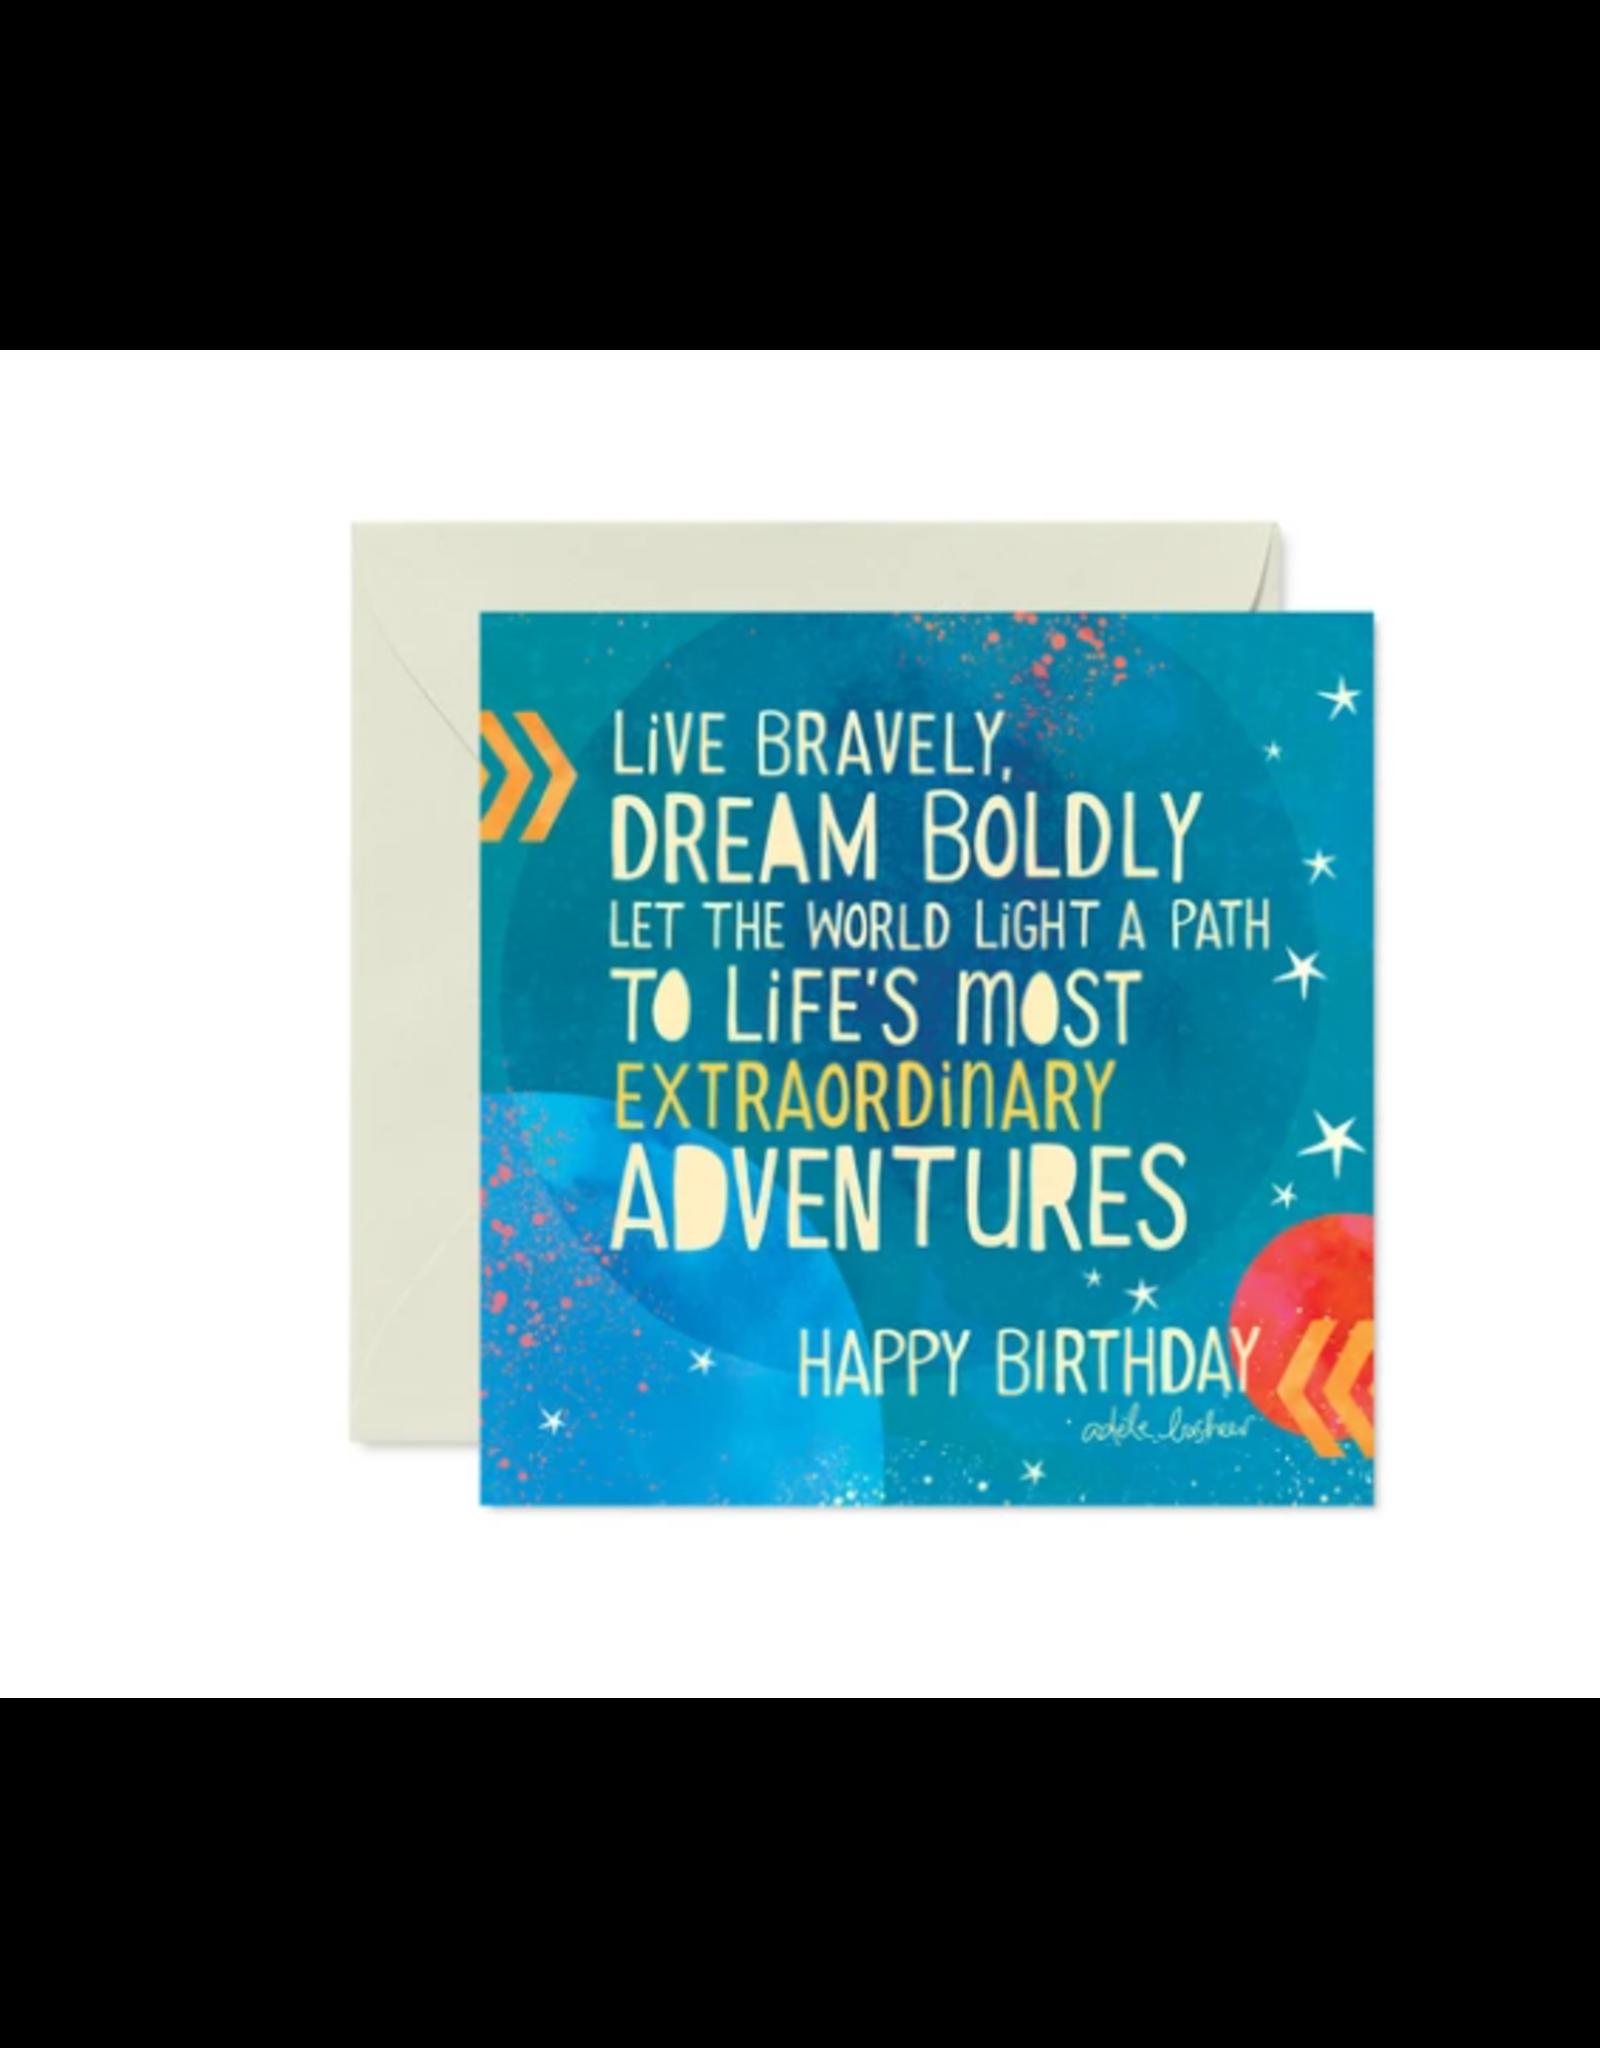 Intrinsic Birthday Adventures Greeting Card